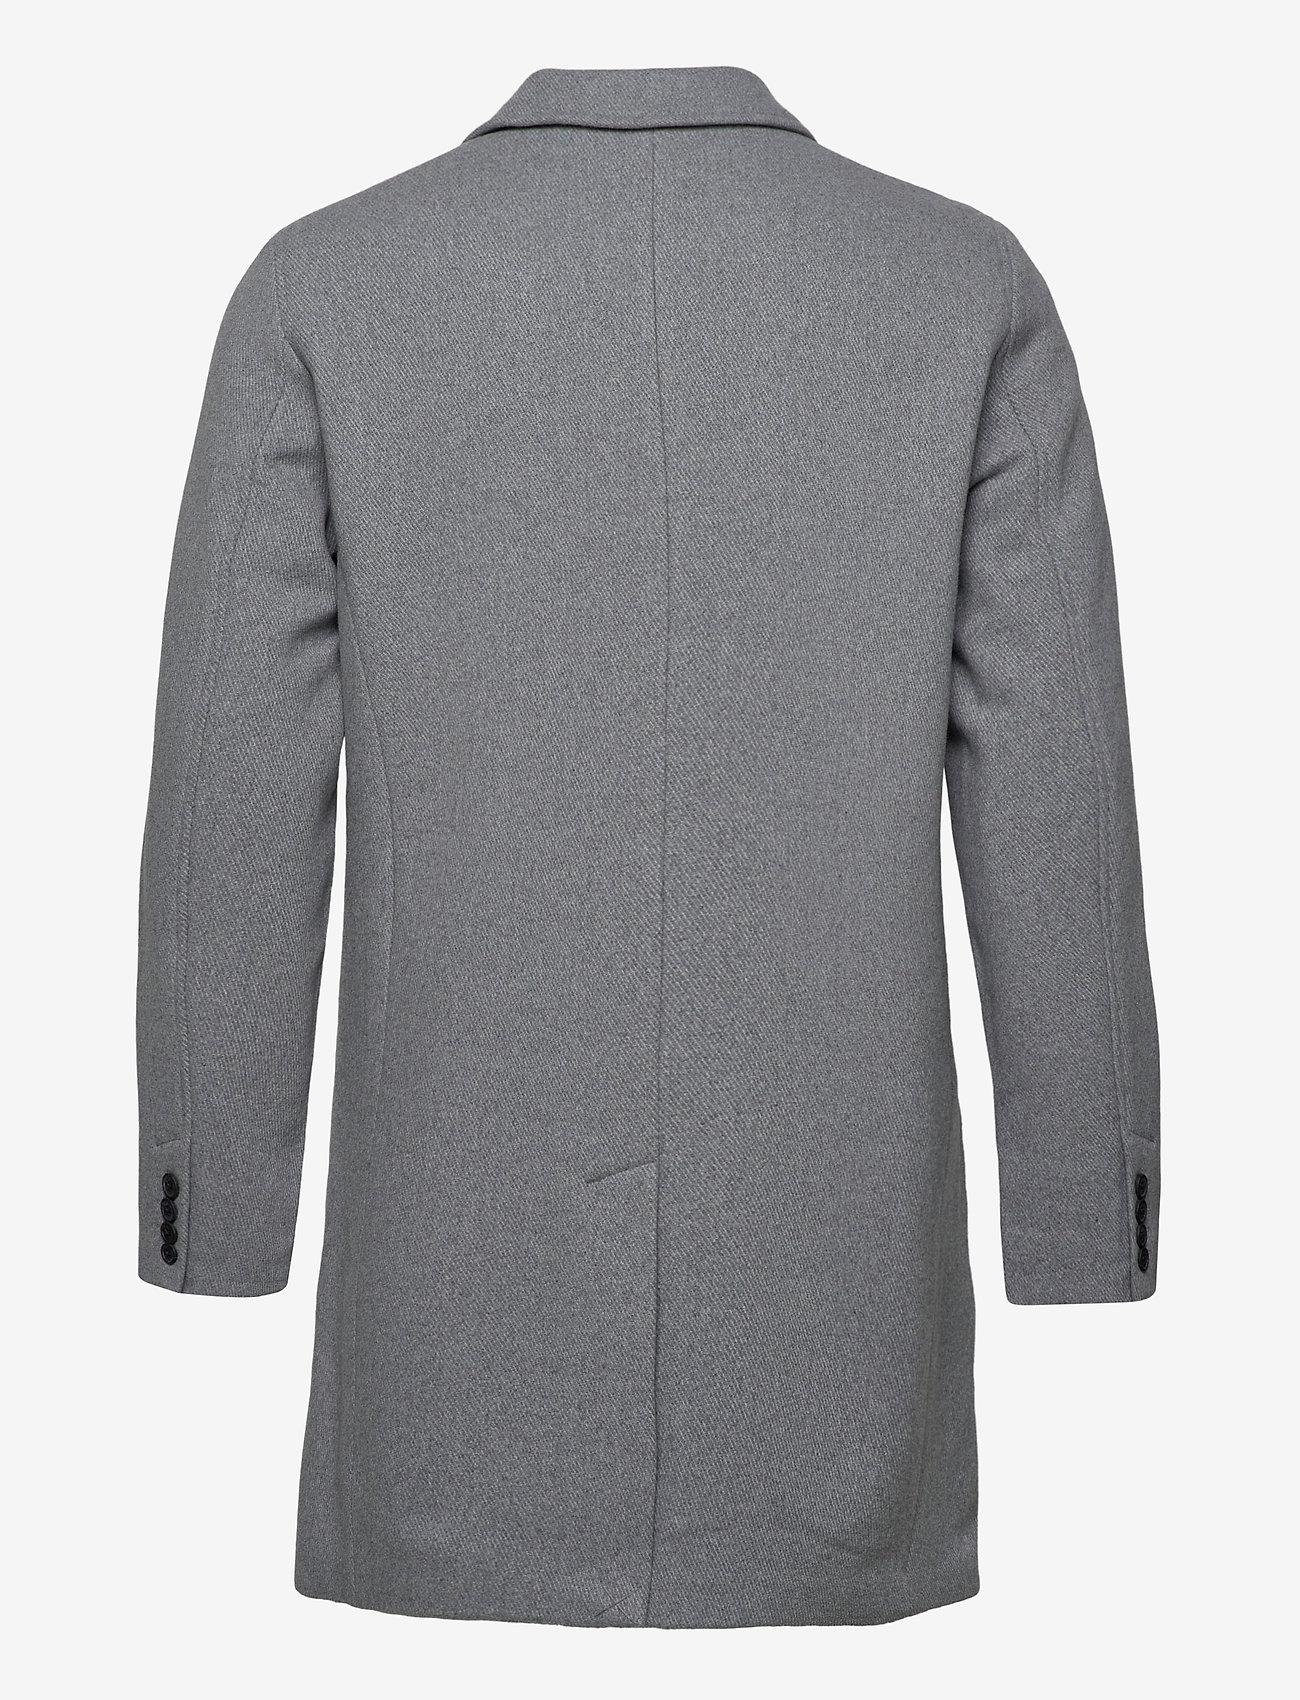 Selected Homme - SLHHAGEN  WOOL COAT B - wollen mantels - grey melange - 1